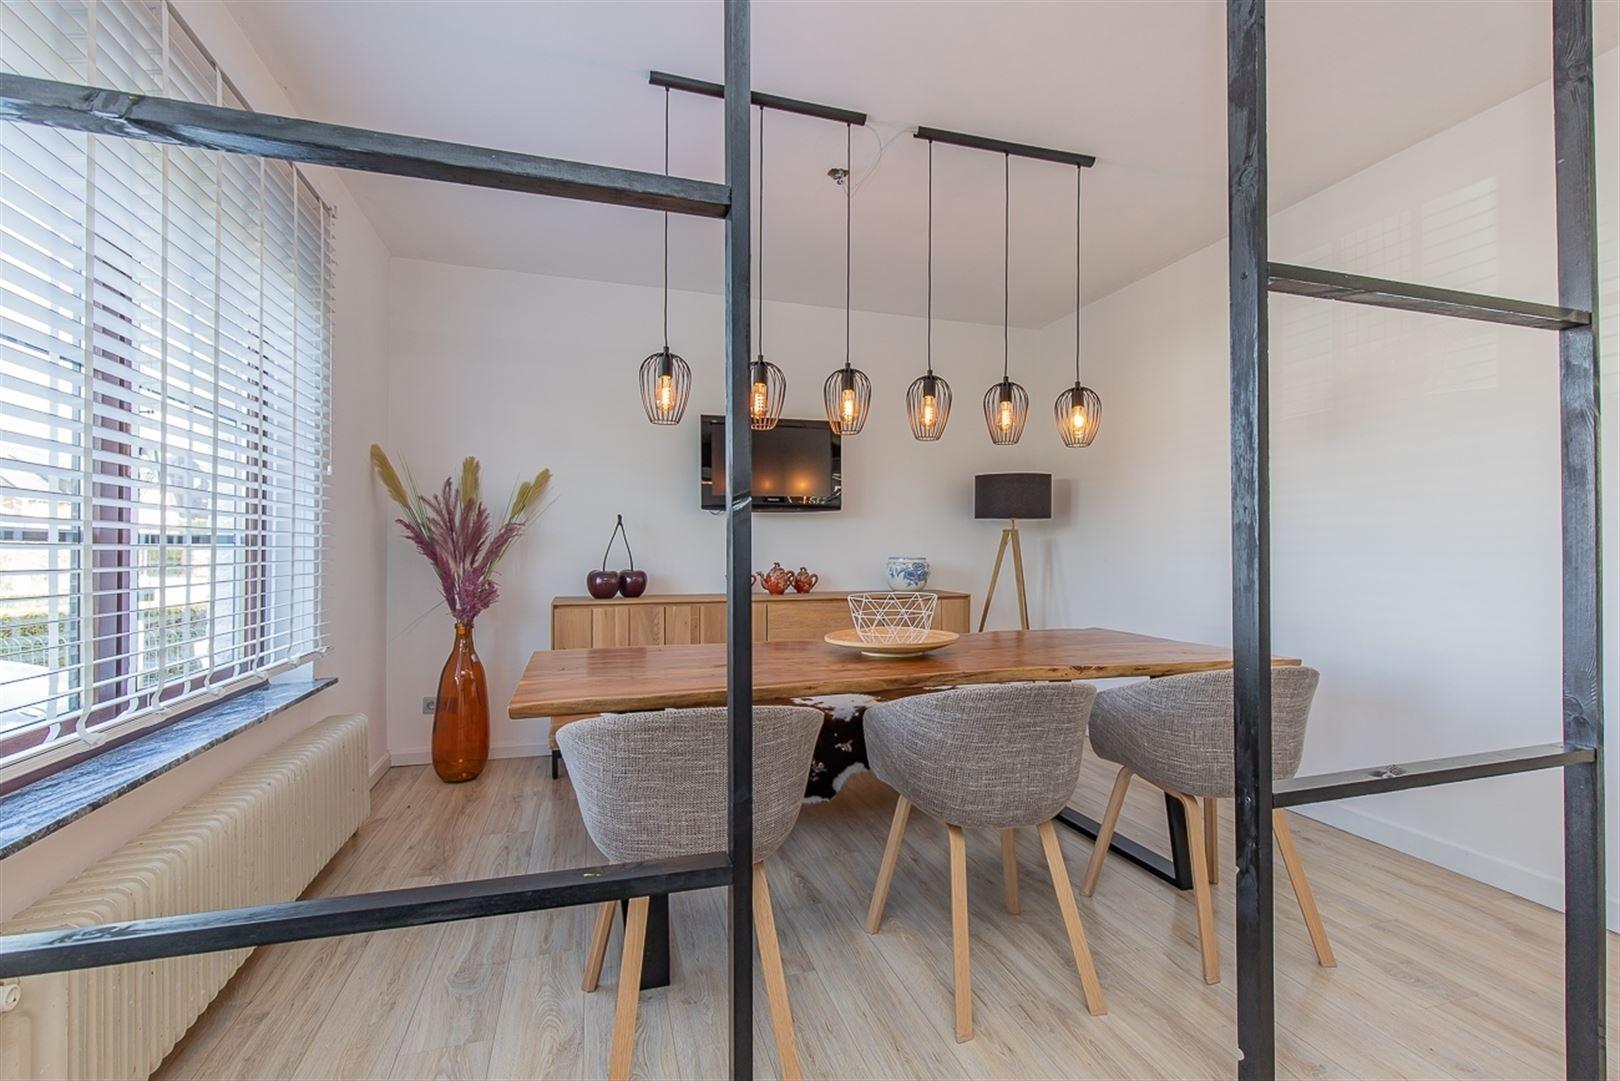 Foto 4 : Villa te 9100 SINT-NIKLAAS (België) - Prijs € 549.000